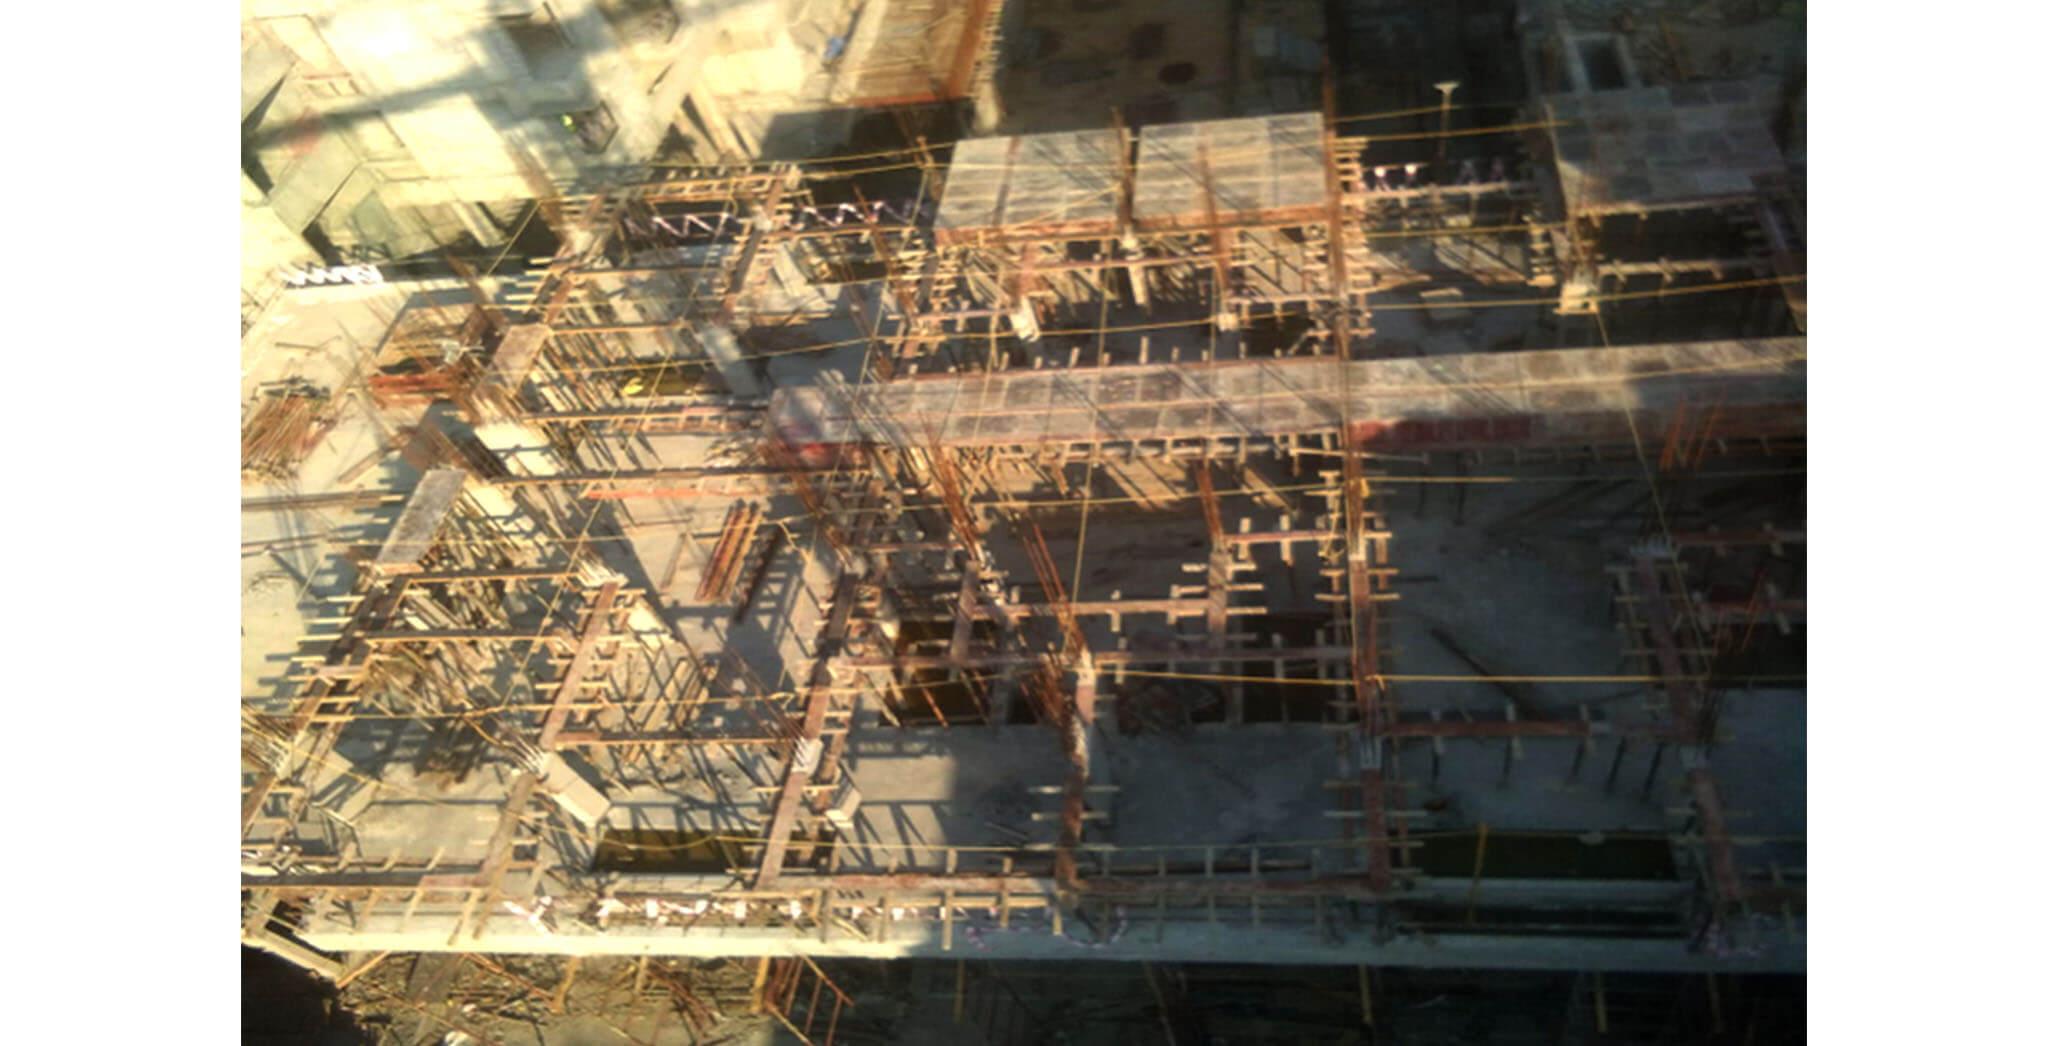 Feb 2021 - Podium side view: H Block—Third Floor shuttering work-in-progress